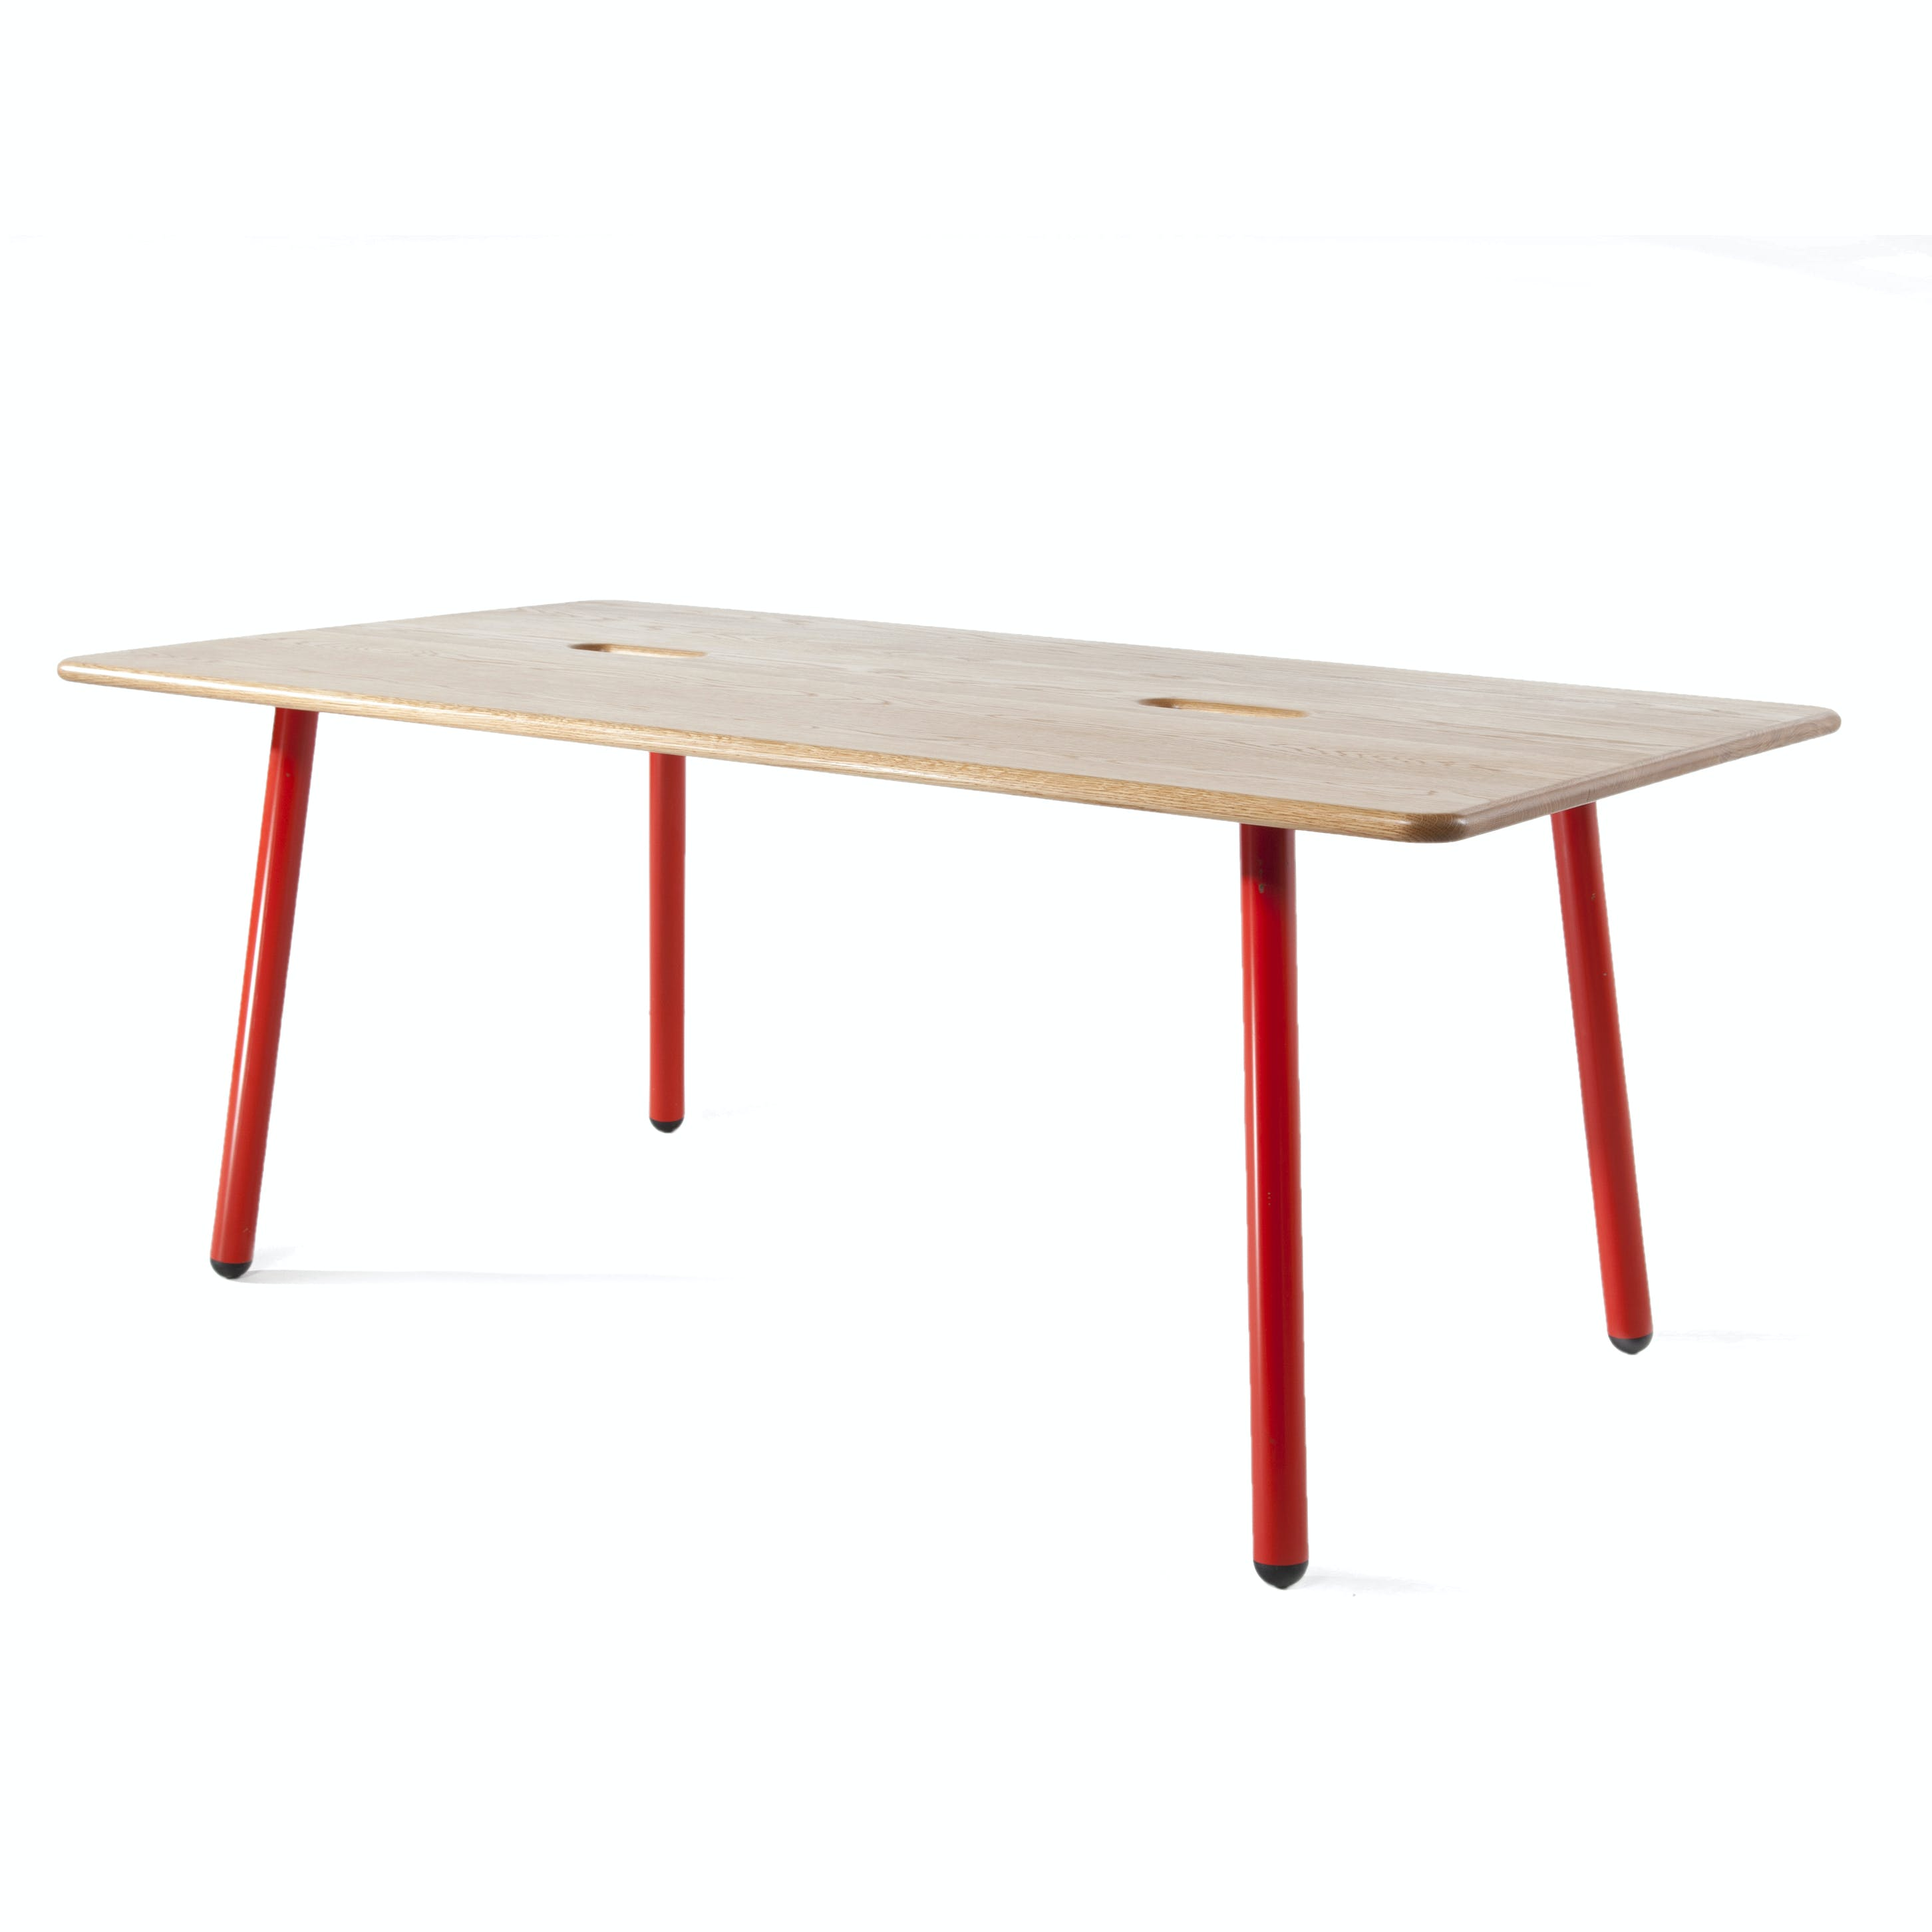 Deadgood-working-table-large-angle-haute-living